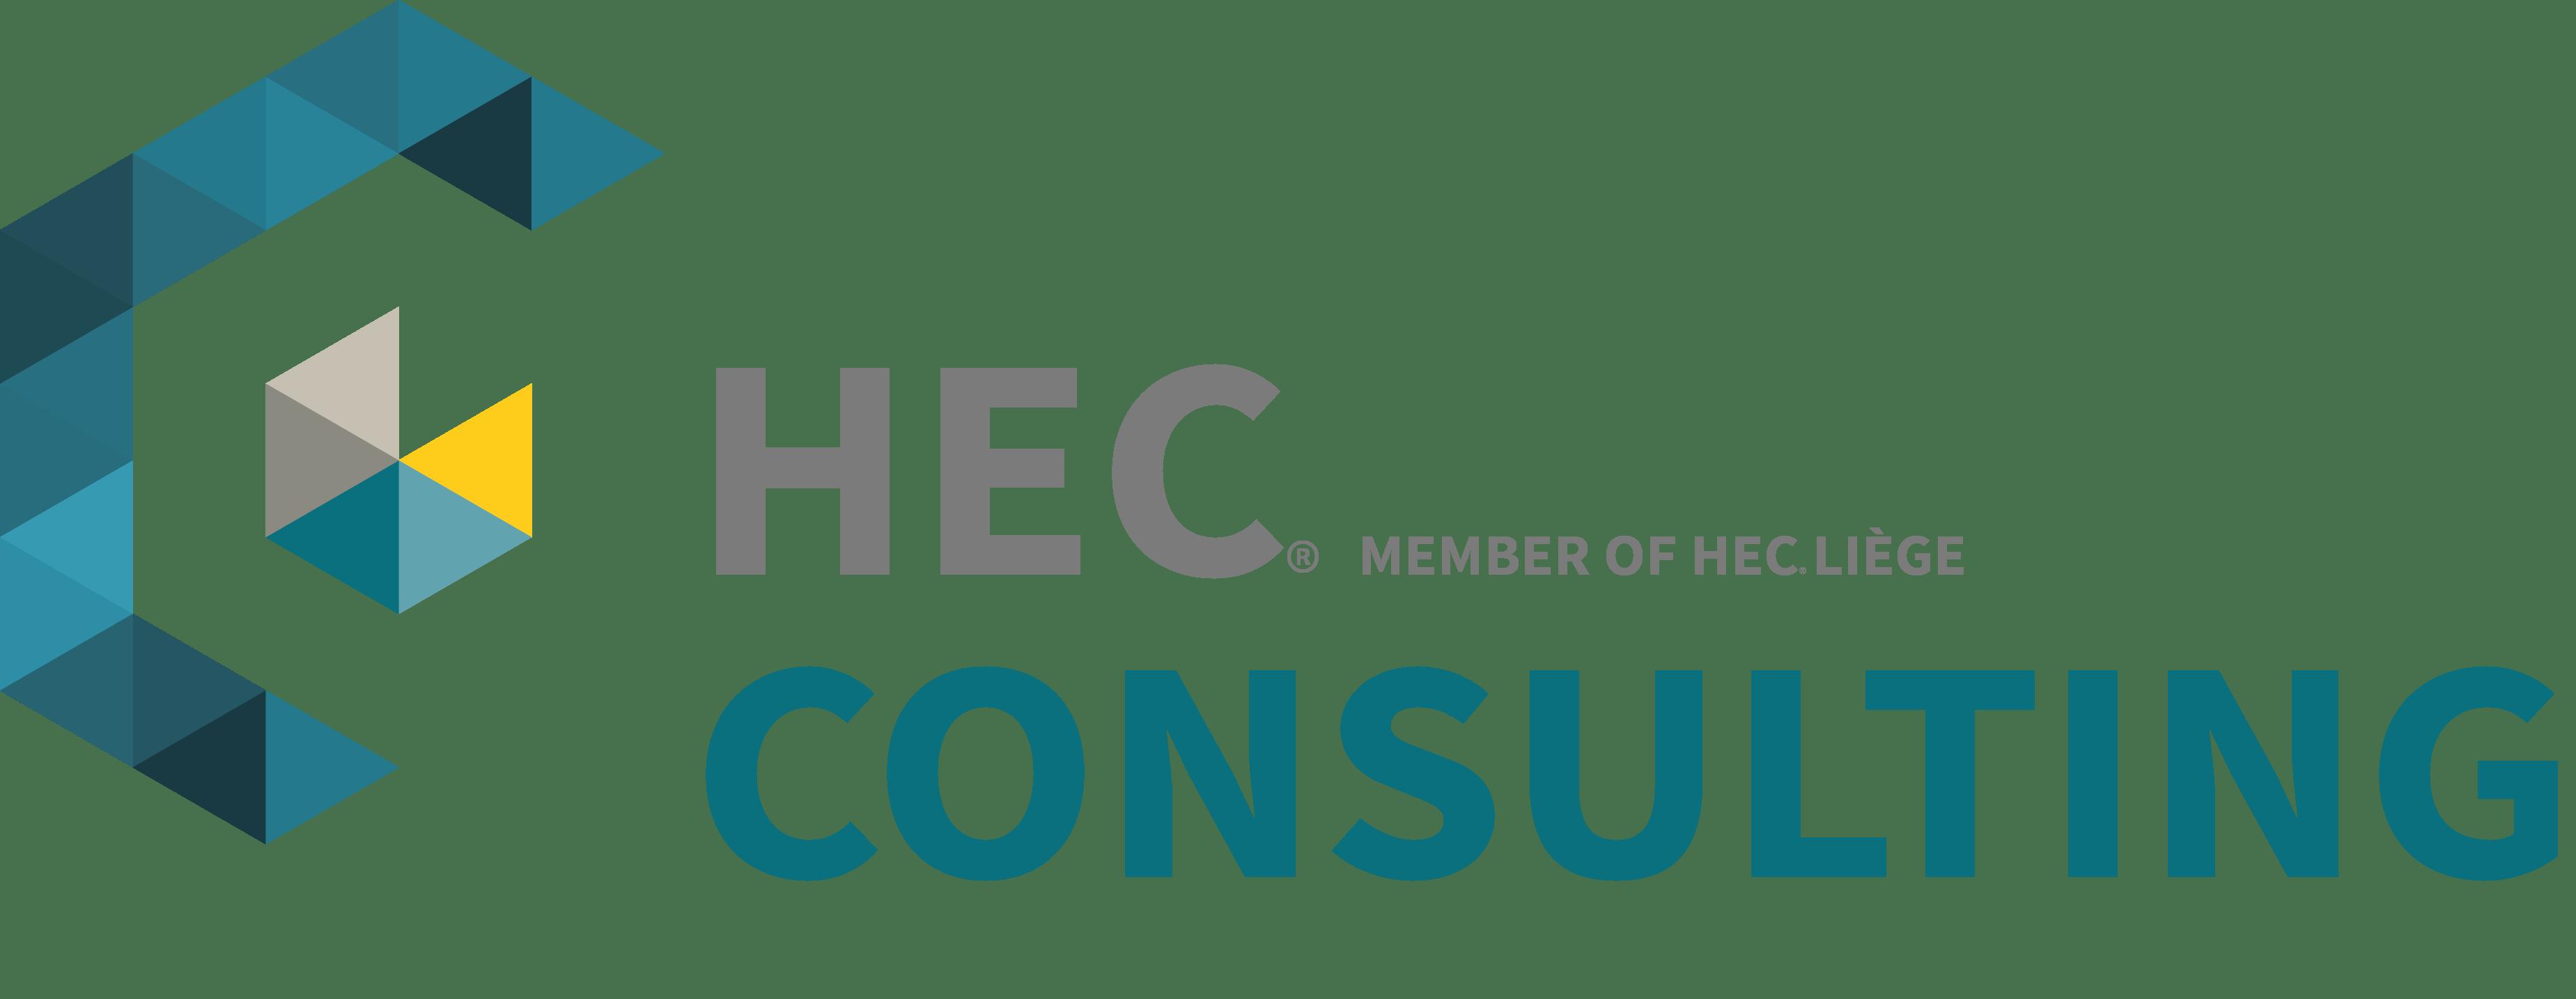 HEC Consulting